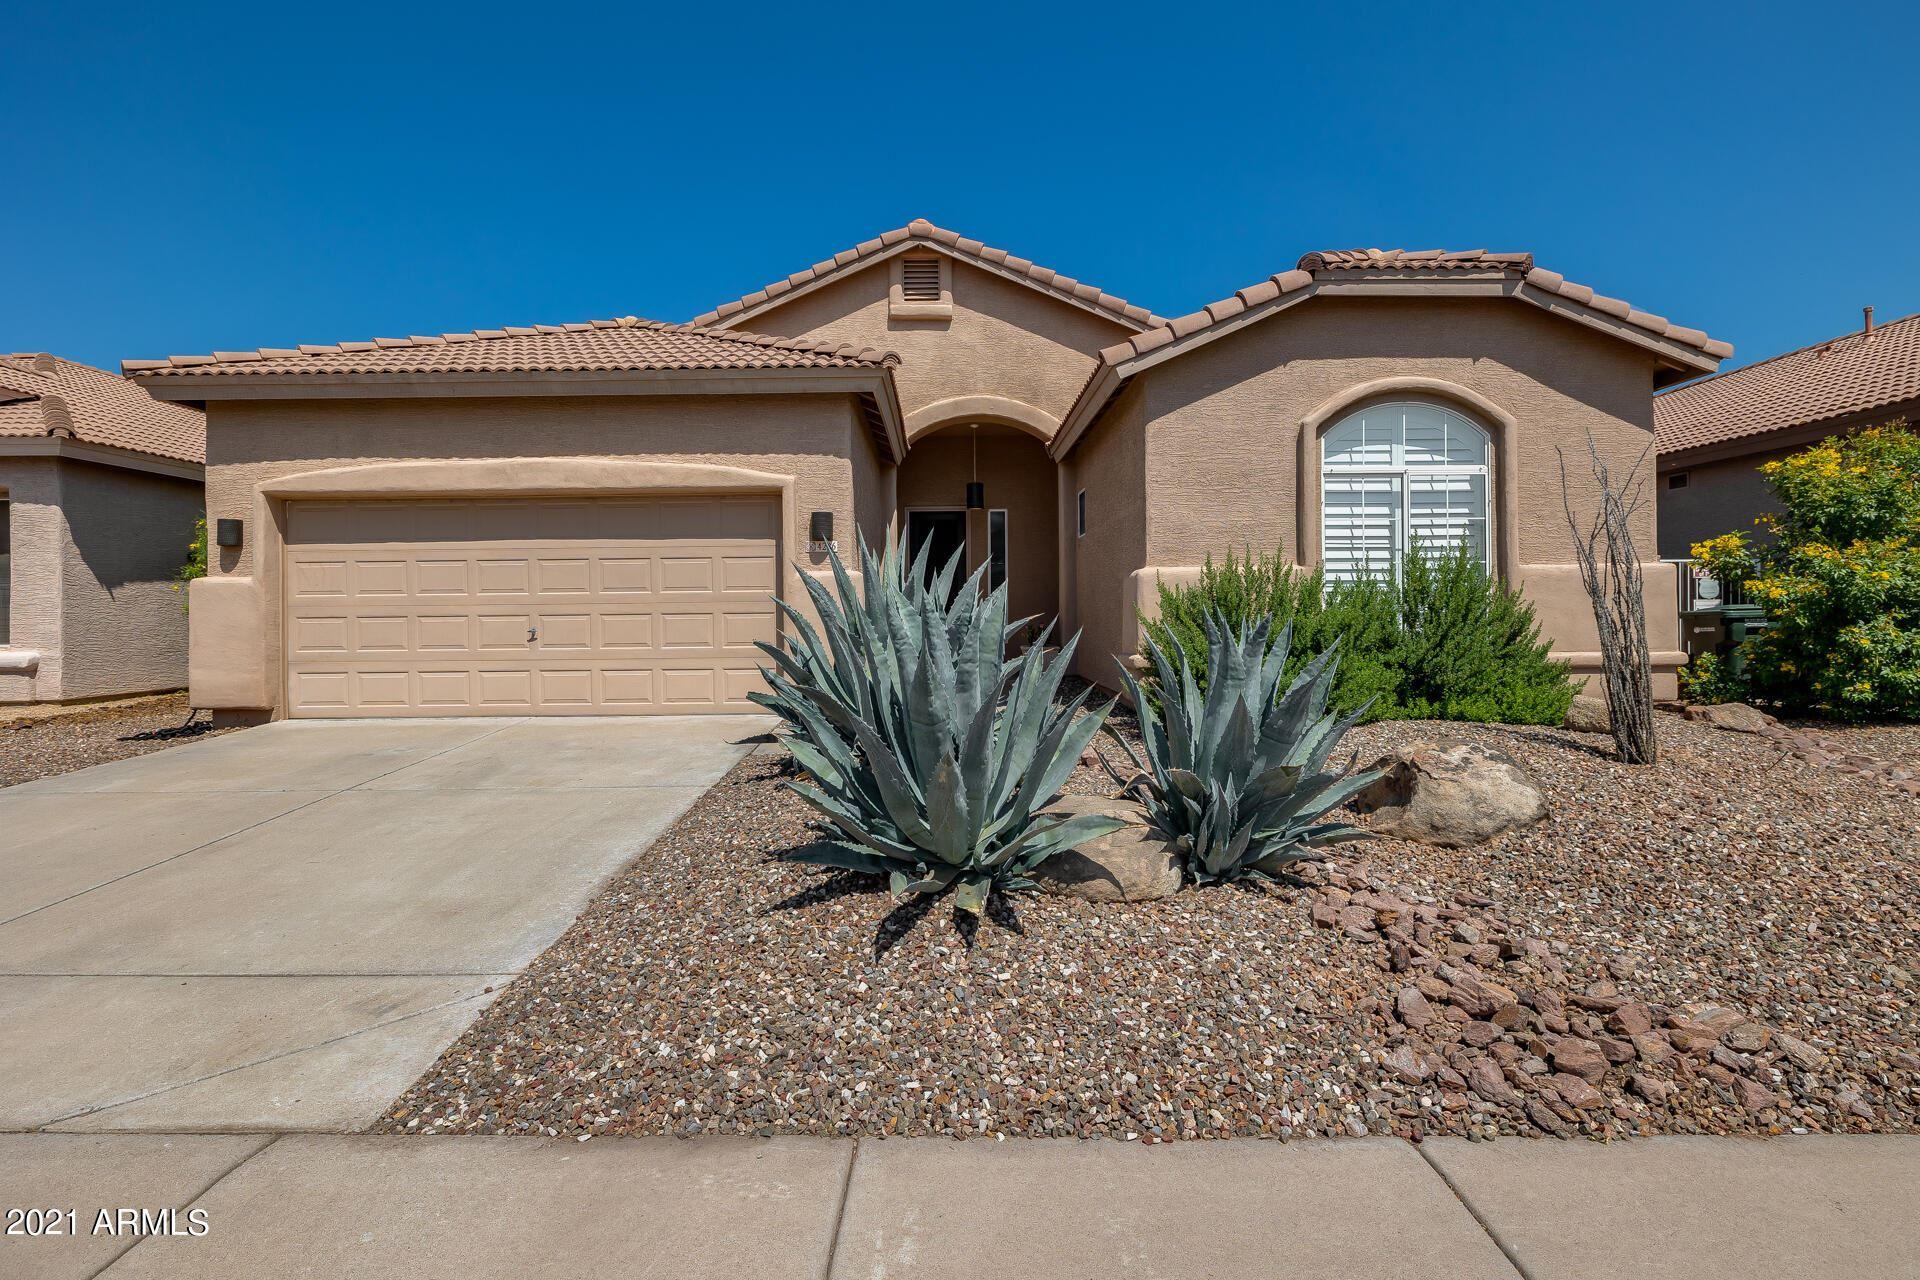 Photo of 4226 E MOLLY Lane, Cave Creek, AZ 85331 (MLS # 6291641)